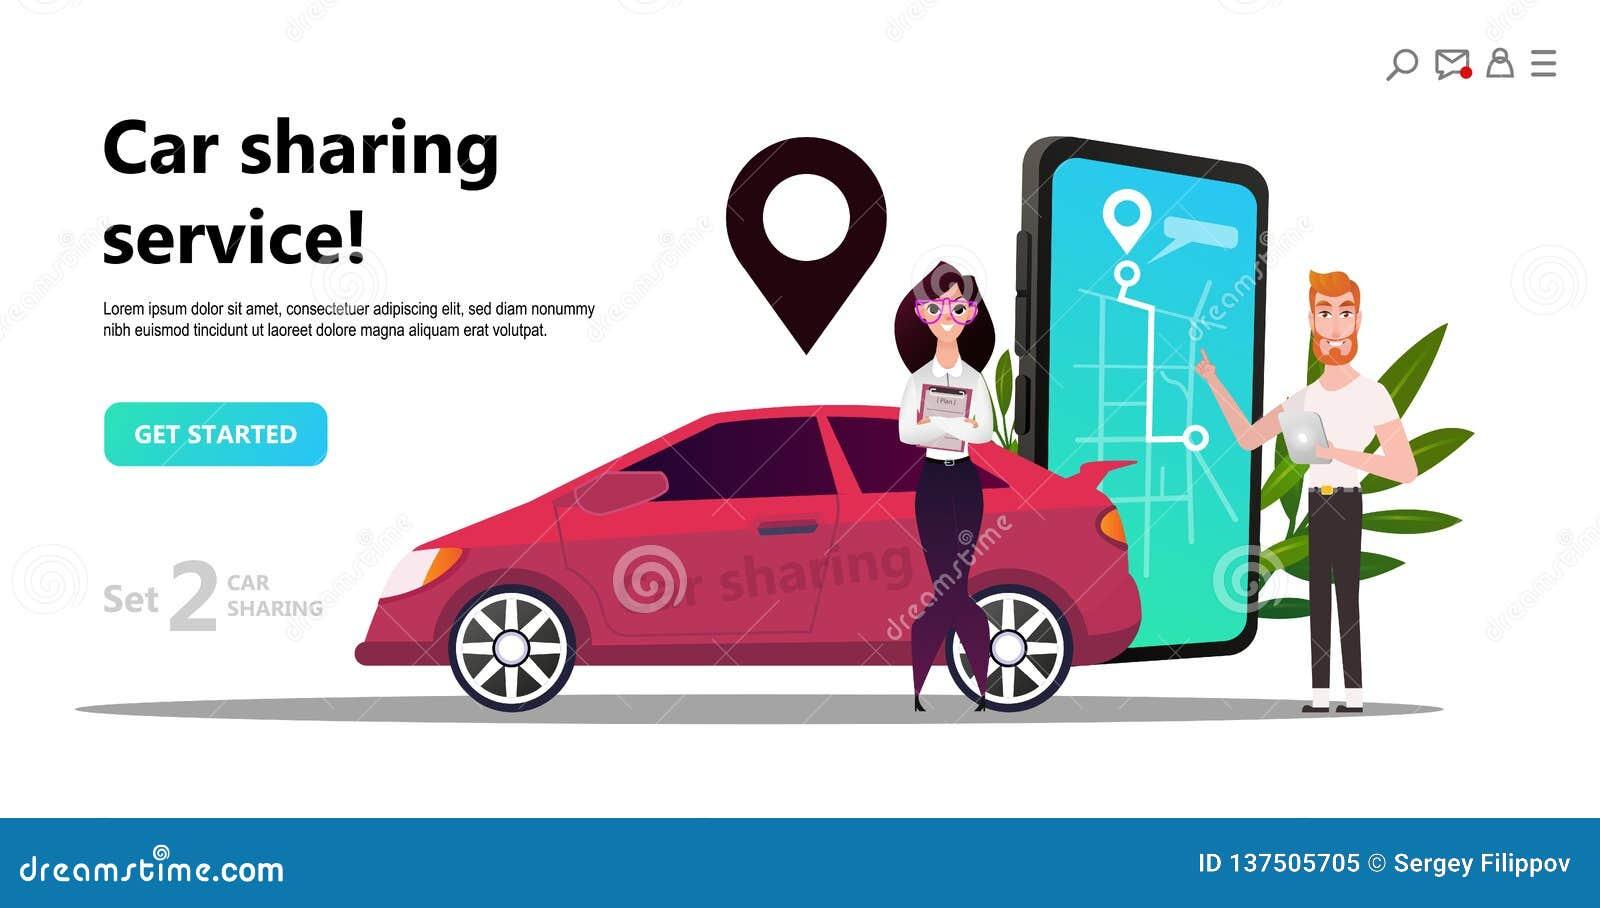 Mobile City Transportation Concept Online Car Sharing Stock Vector